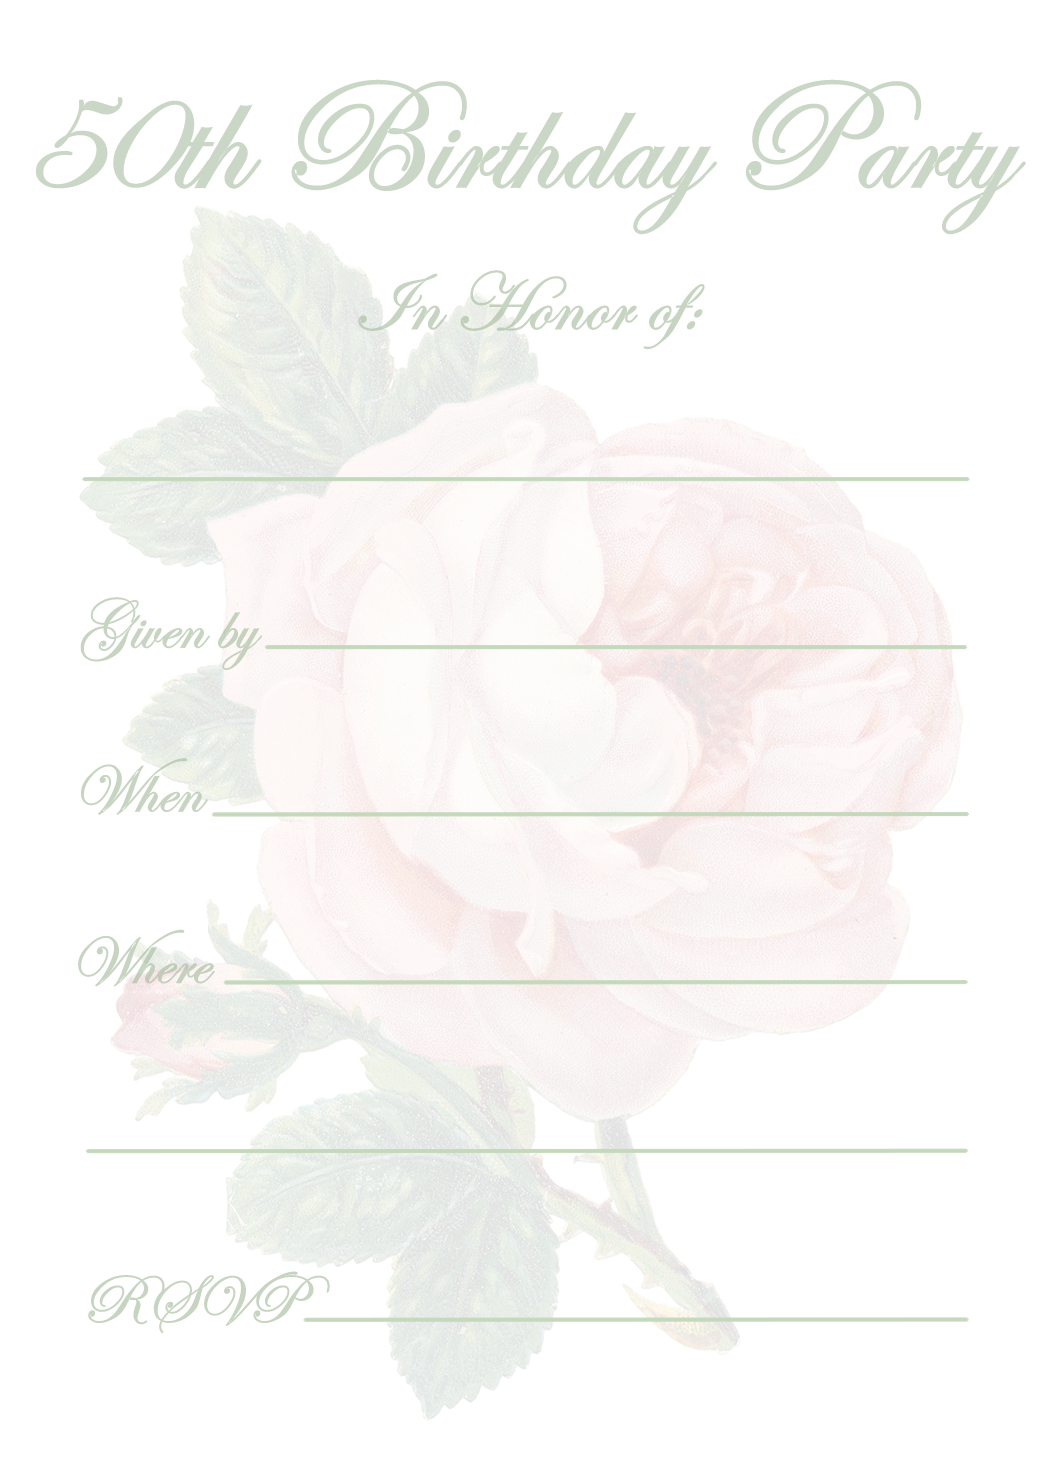 Free Printable 50th Birthday Party Invitation Templates ...